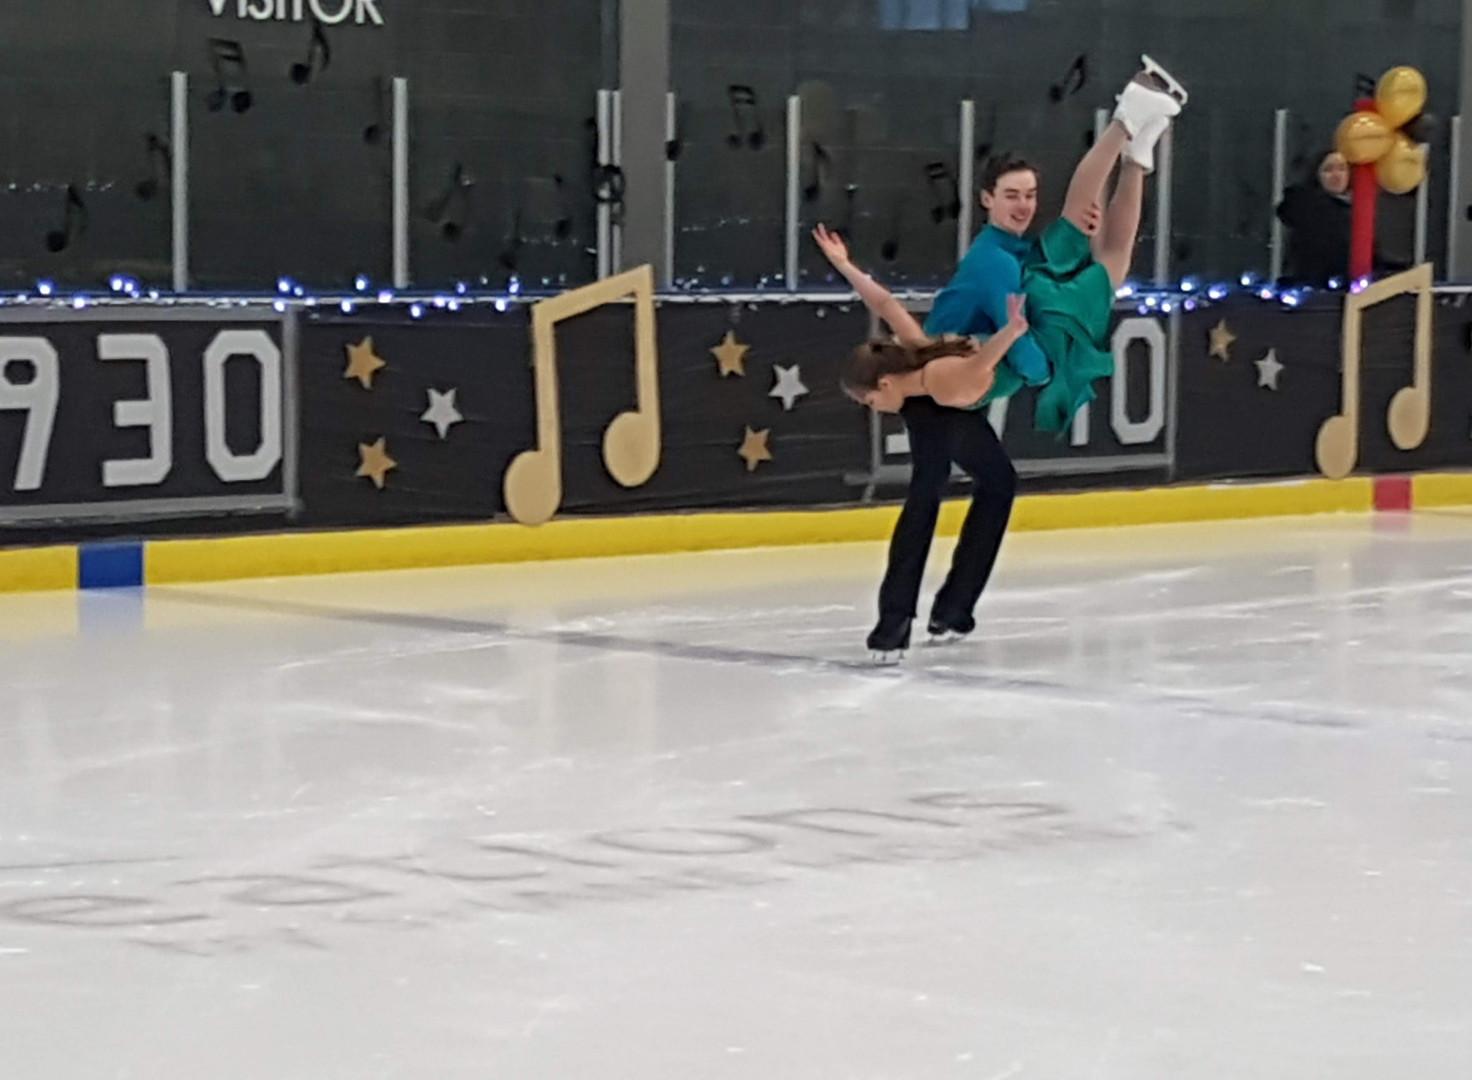 Guest Skater - Kobi & Savanna